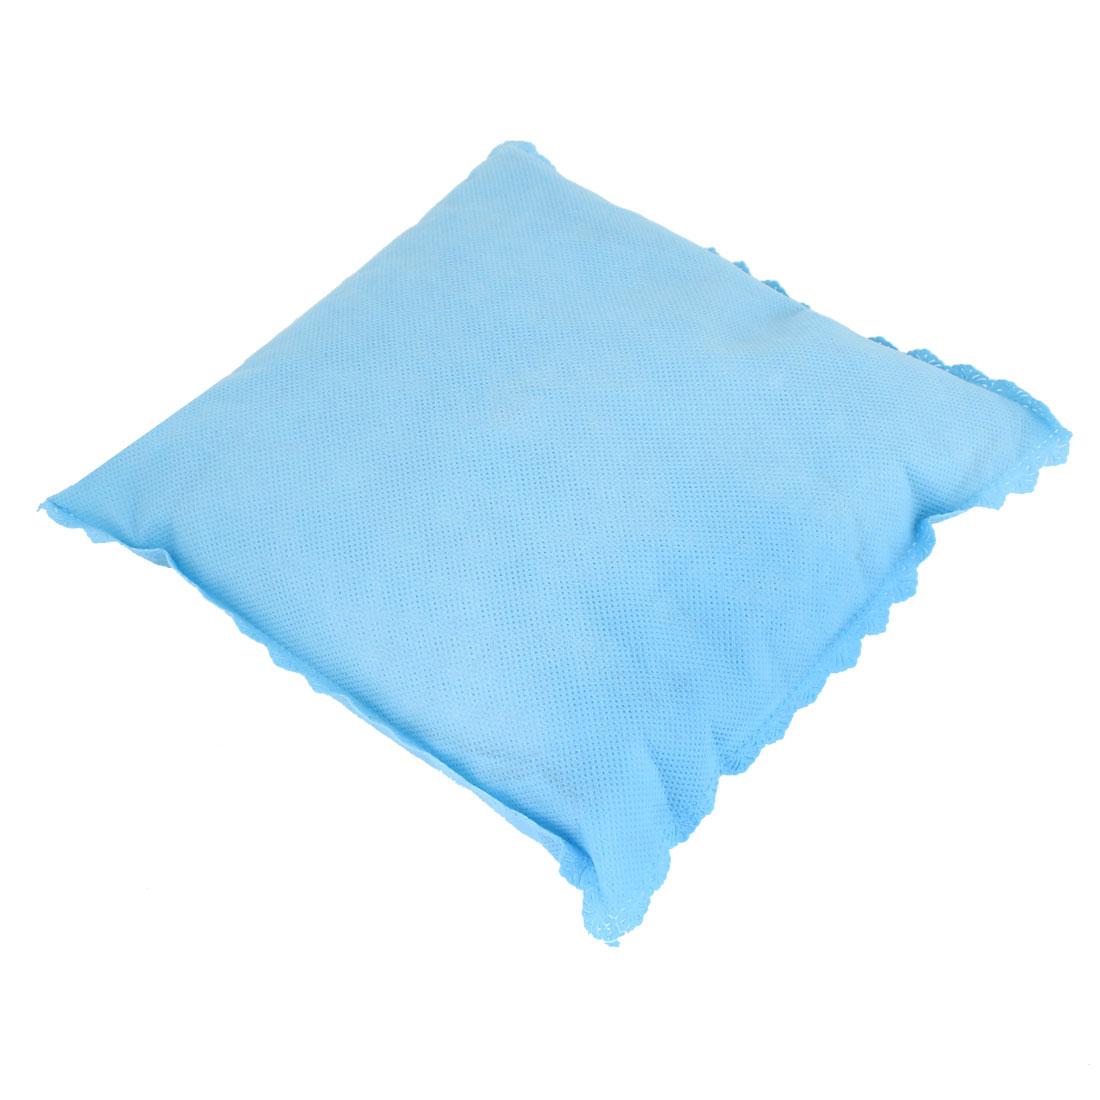 Auto Car Interior Air Deodorant Bamboo Charcoal Bag Package Blue